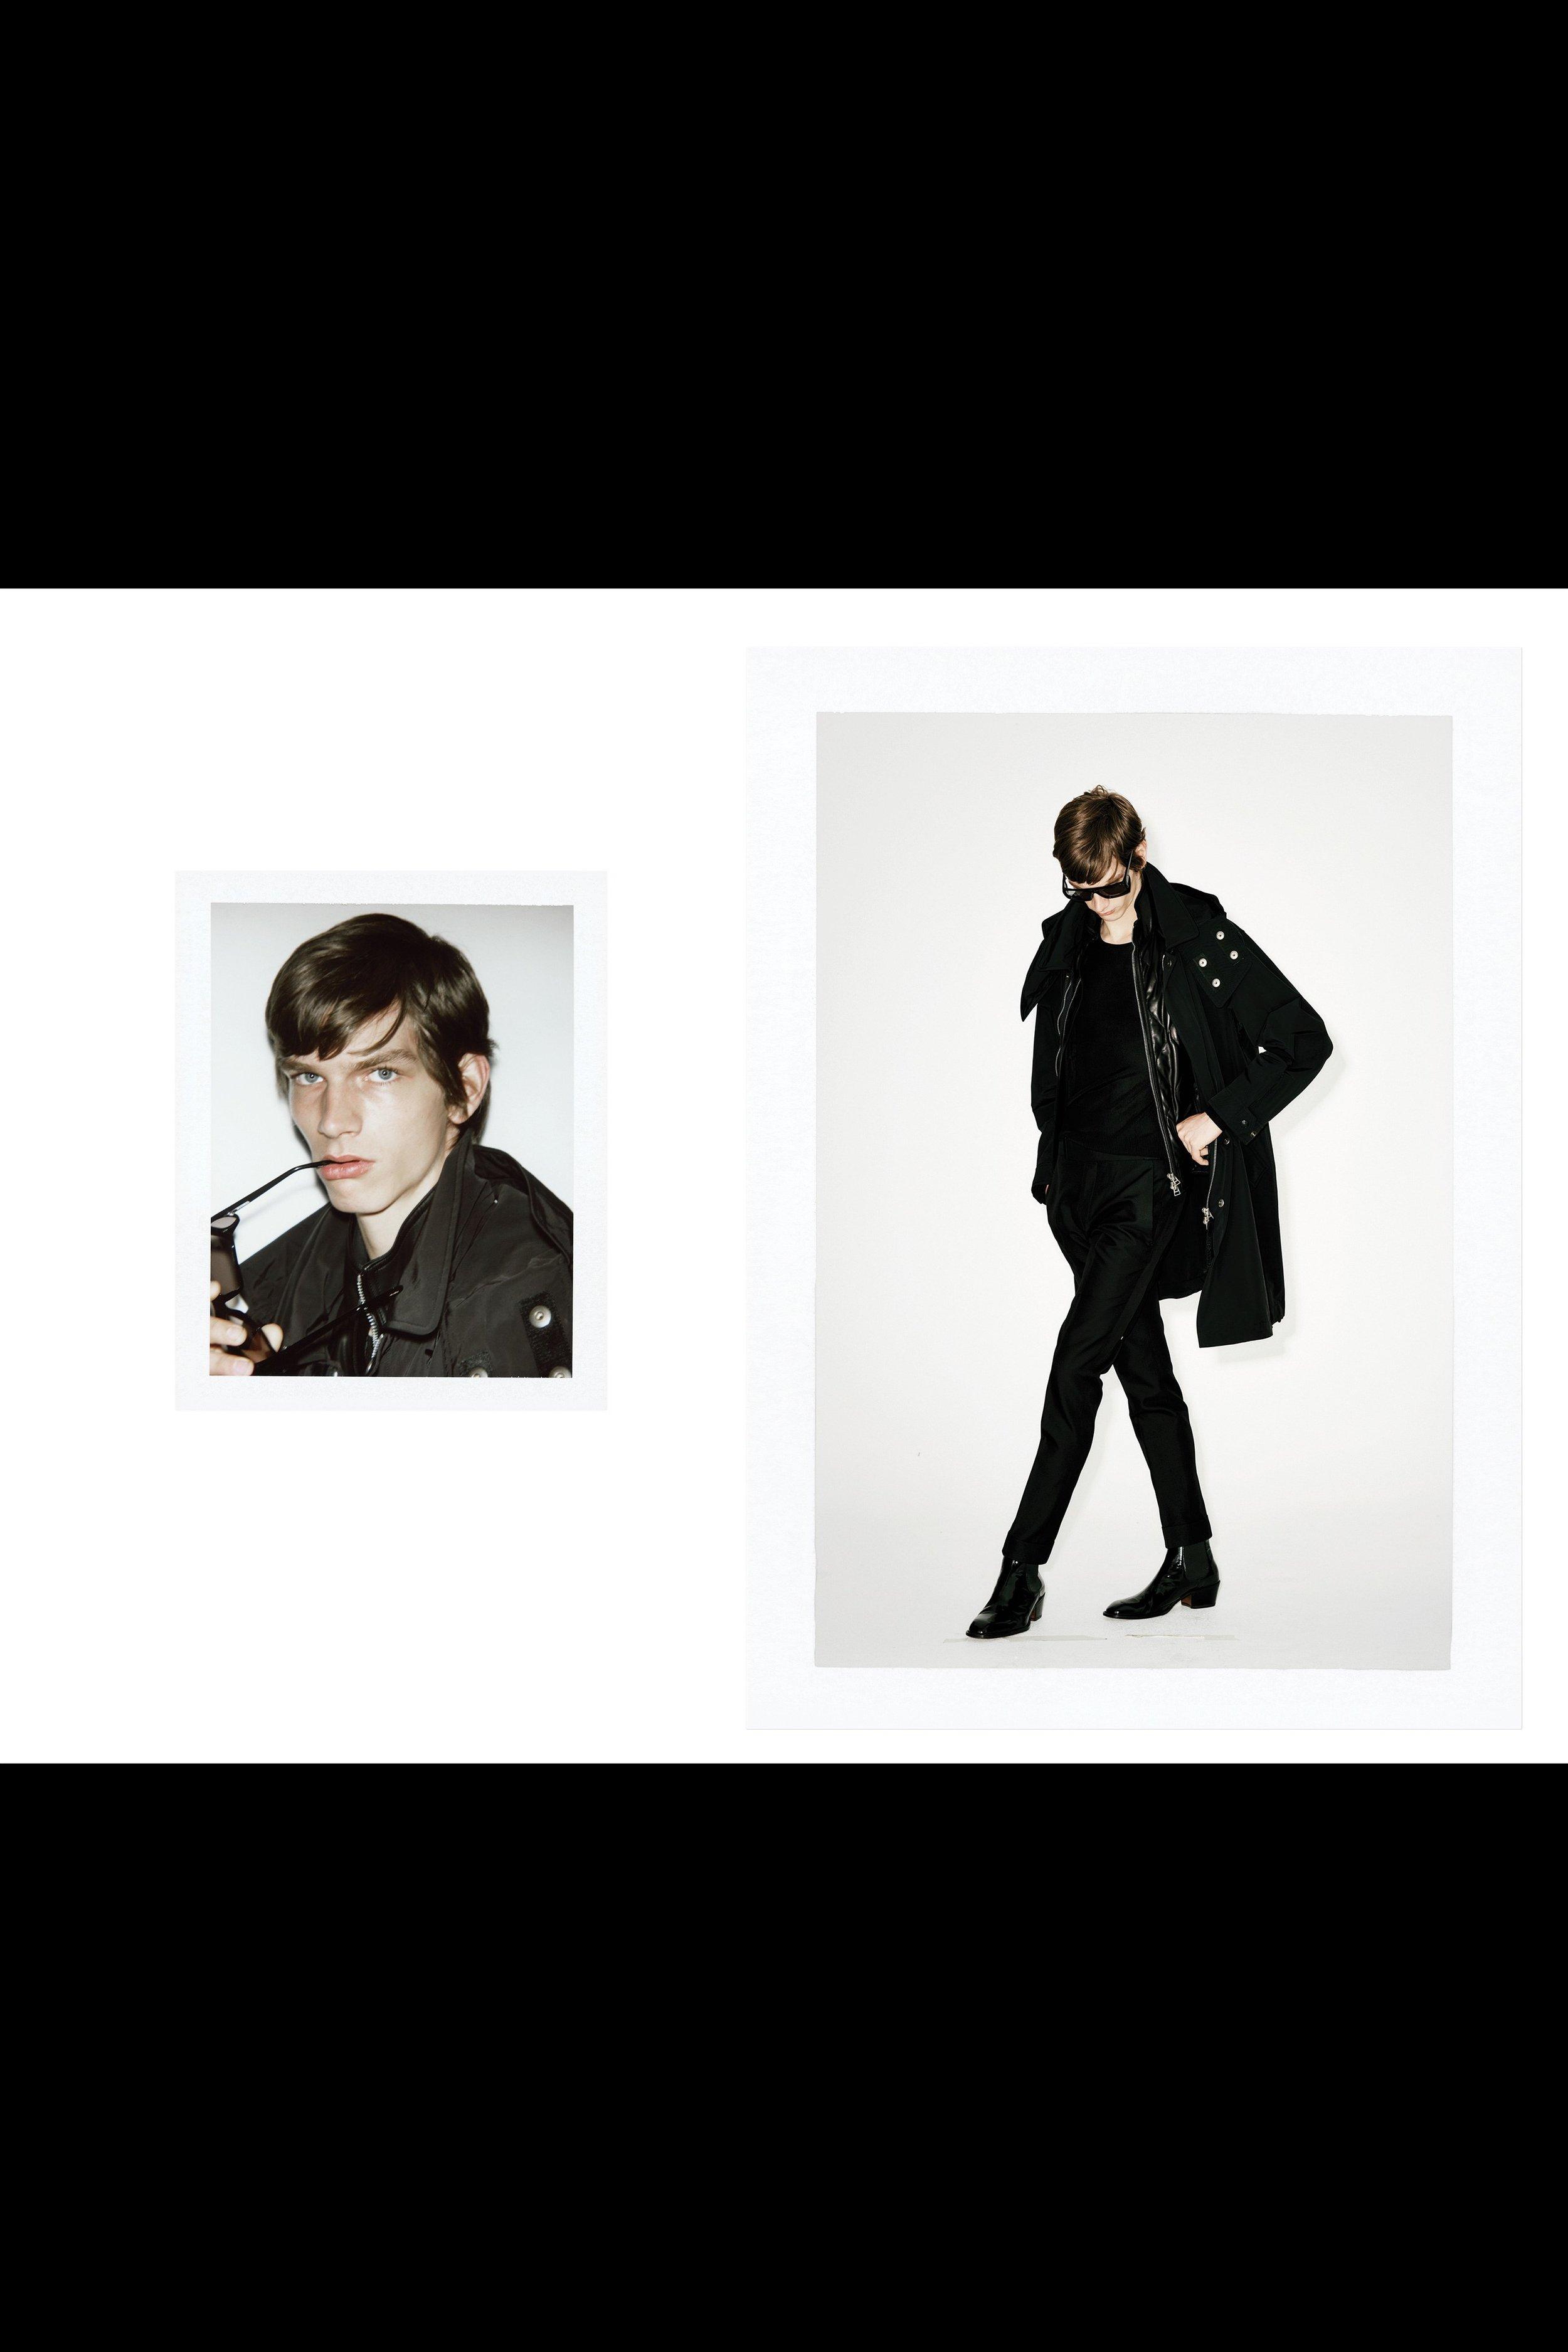 00005-Tom-Ford-vogue-menswear-spring-2019-pr.jpg